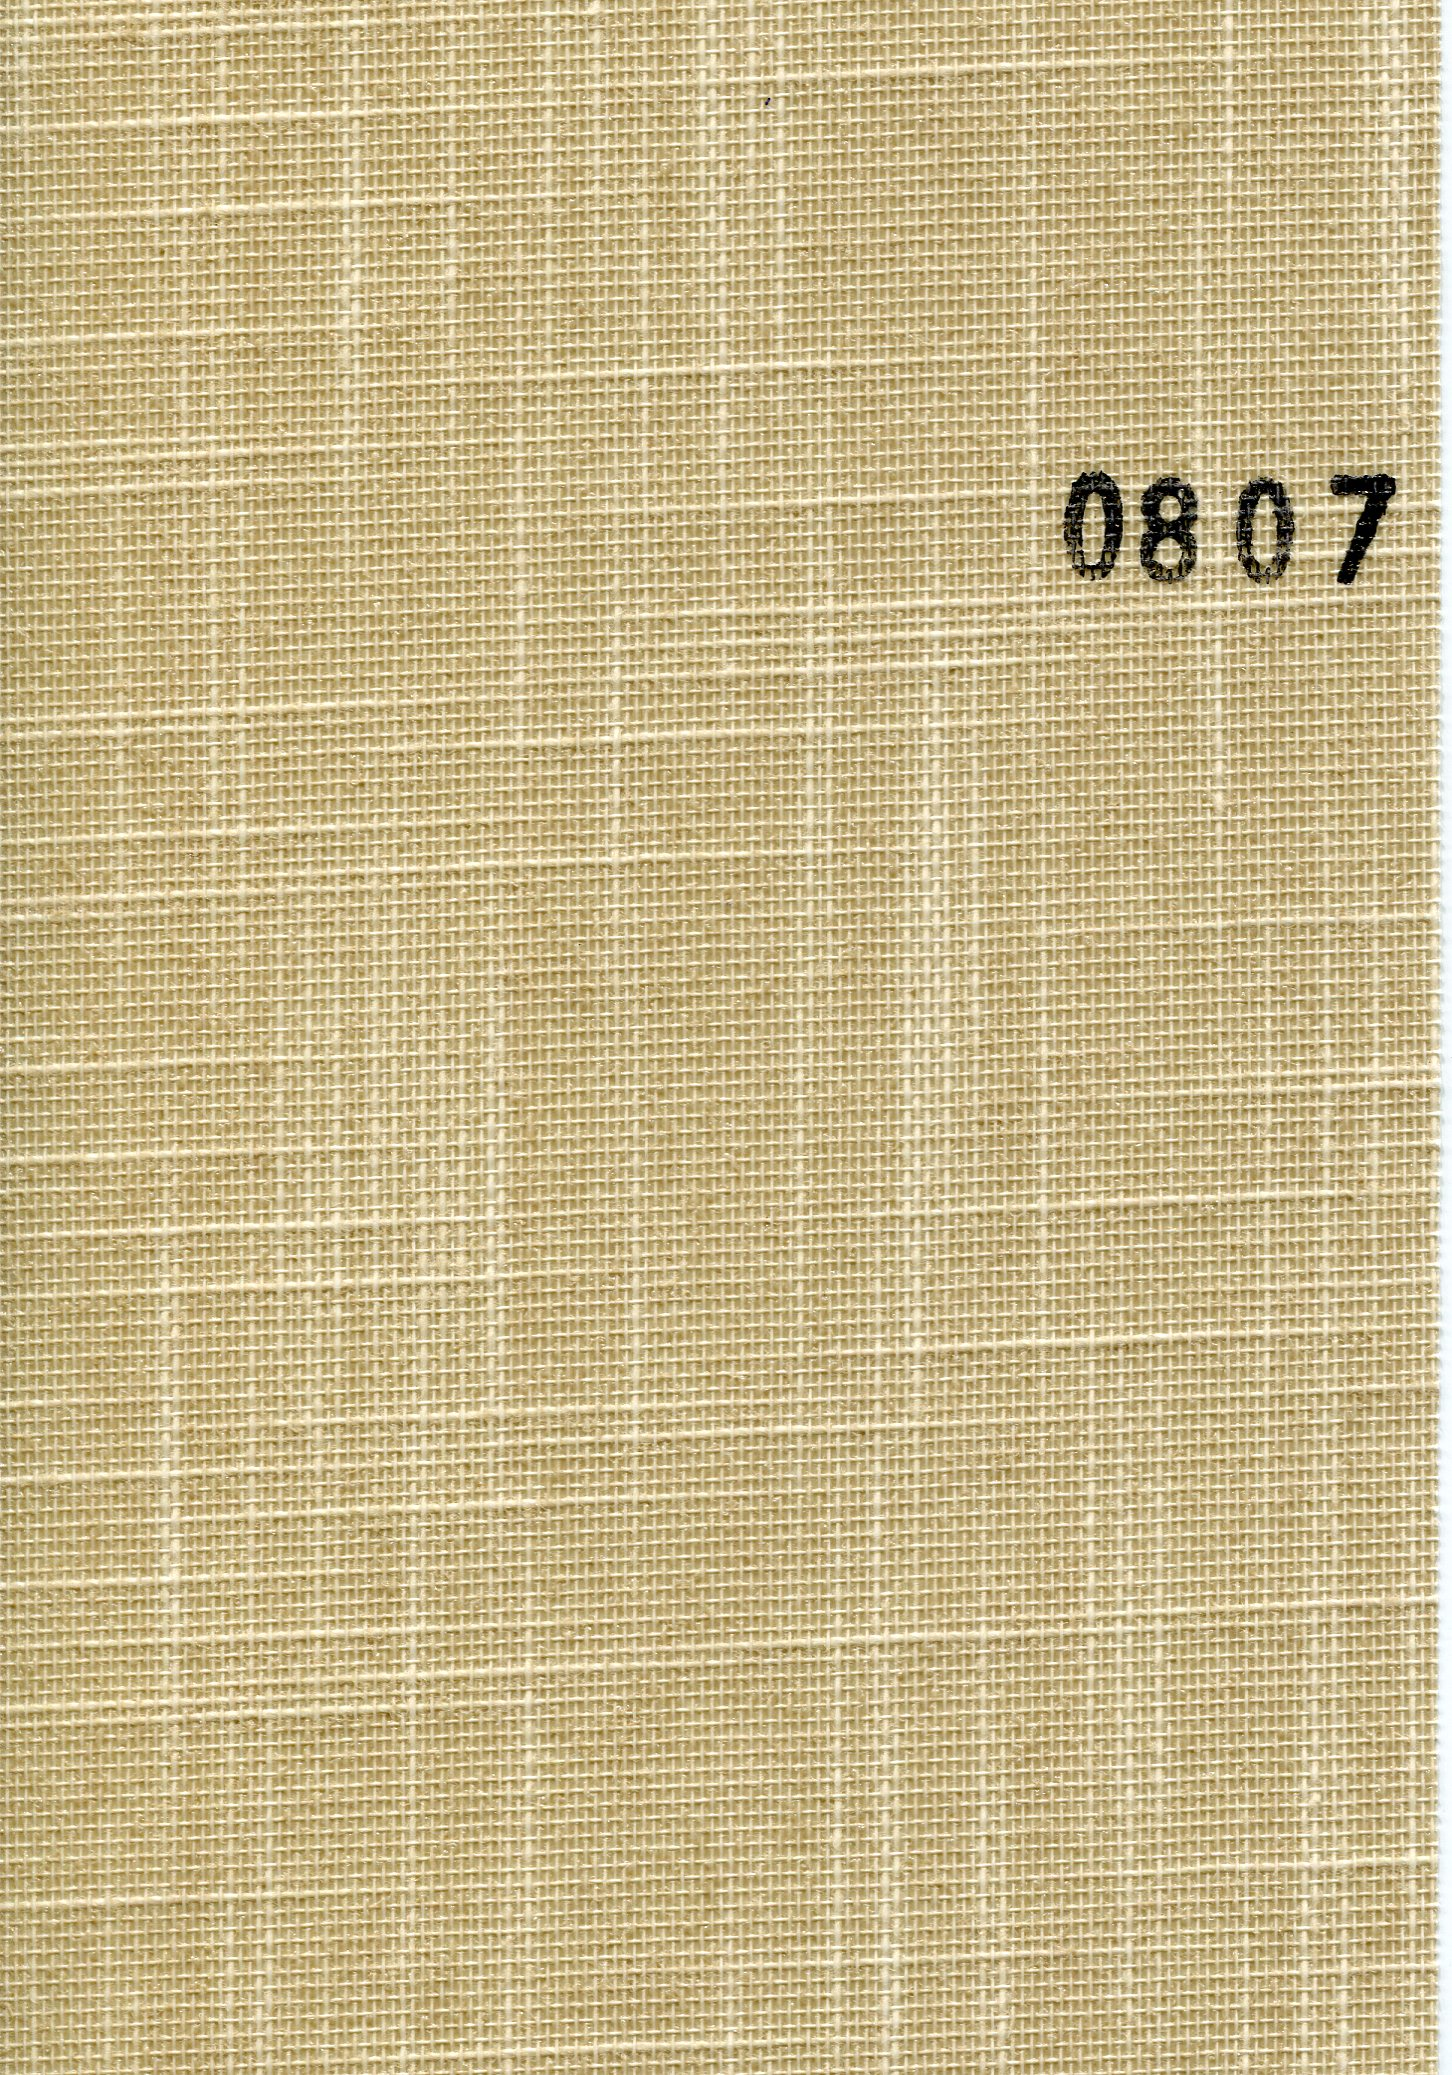 Shantung 0807